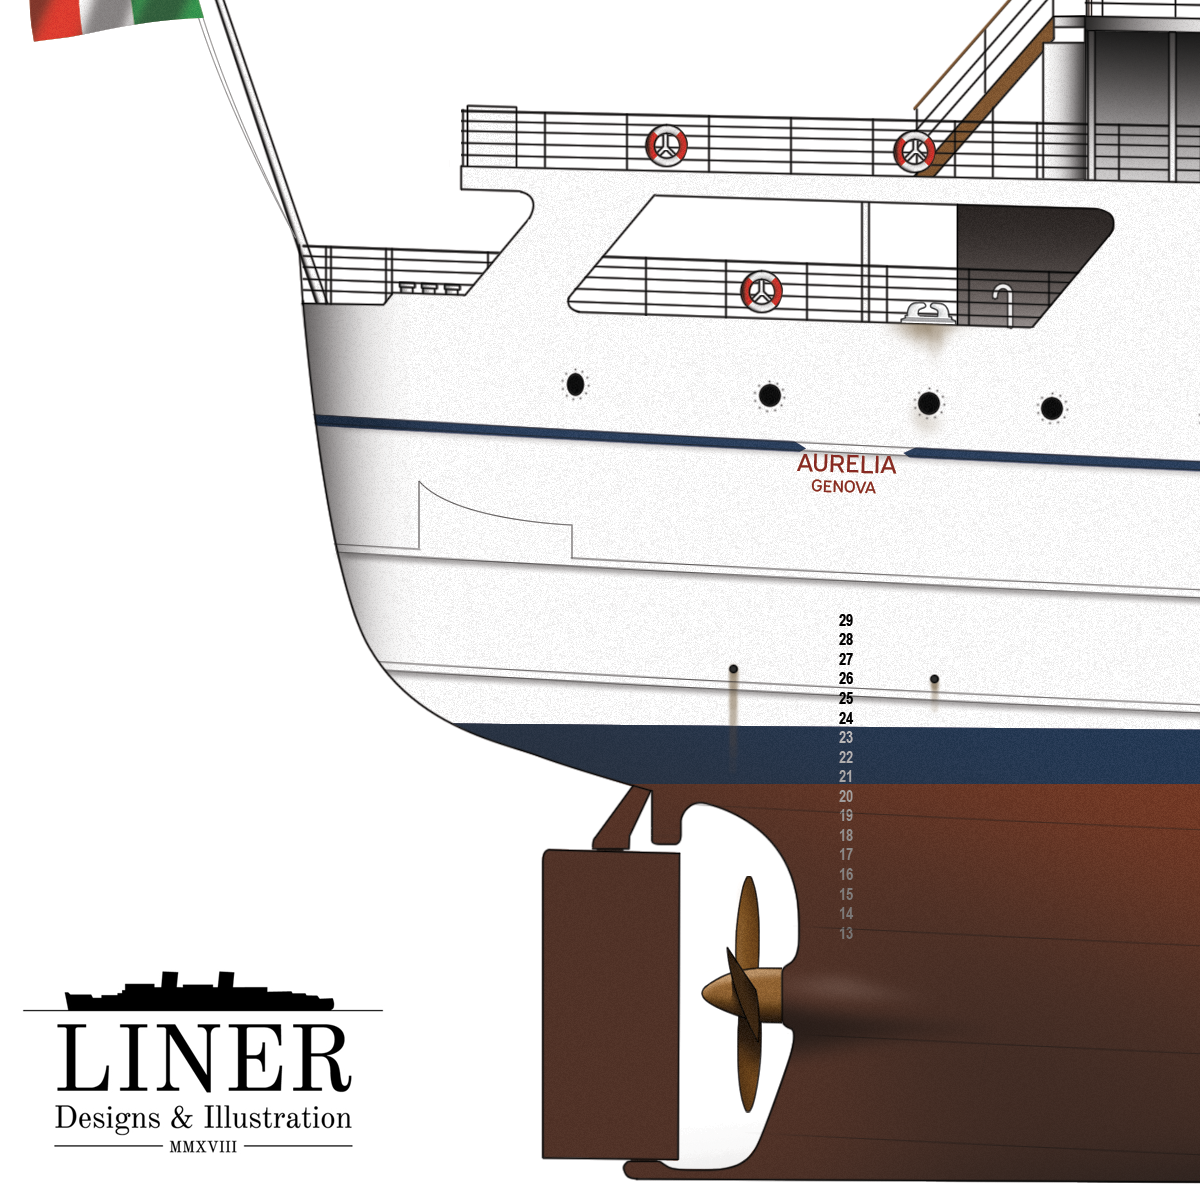 Sleek above the waterline, a glimpse below reveals Aurelia's former life as a single-screw cargo vessel.